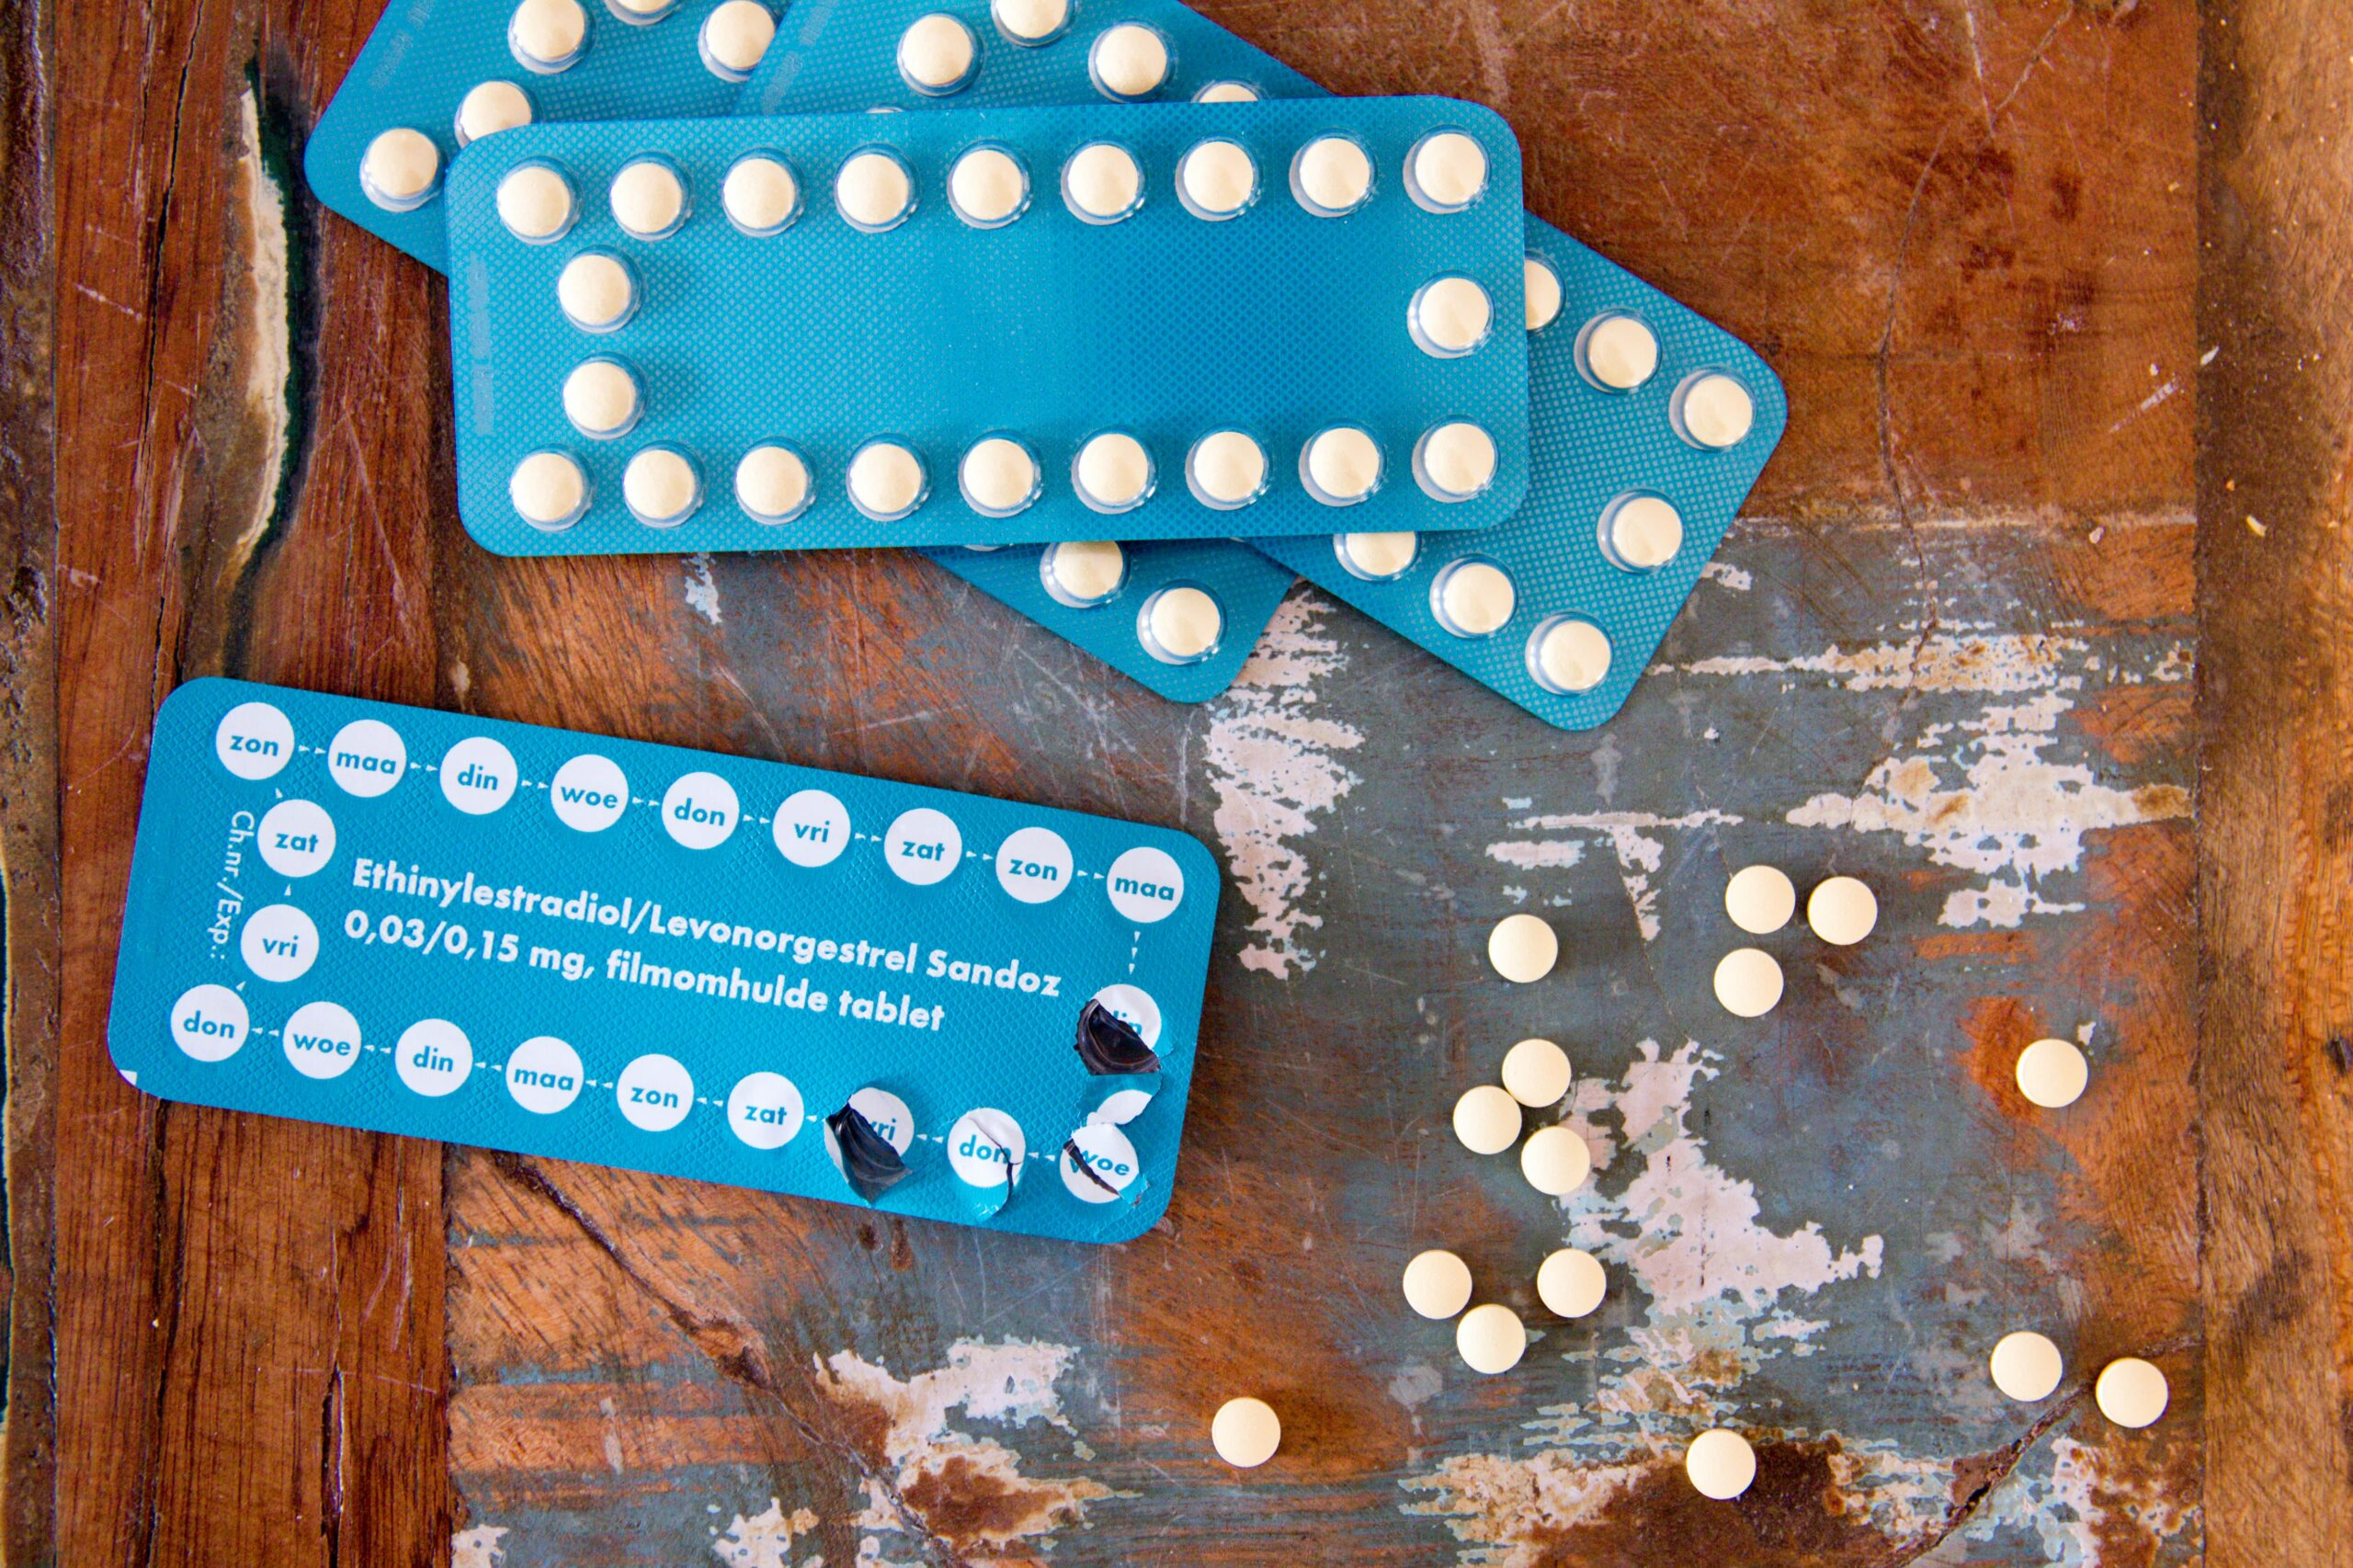 birth control pill packs